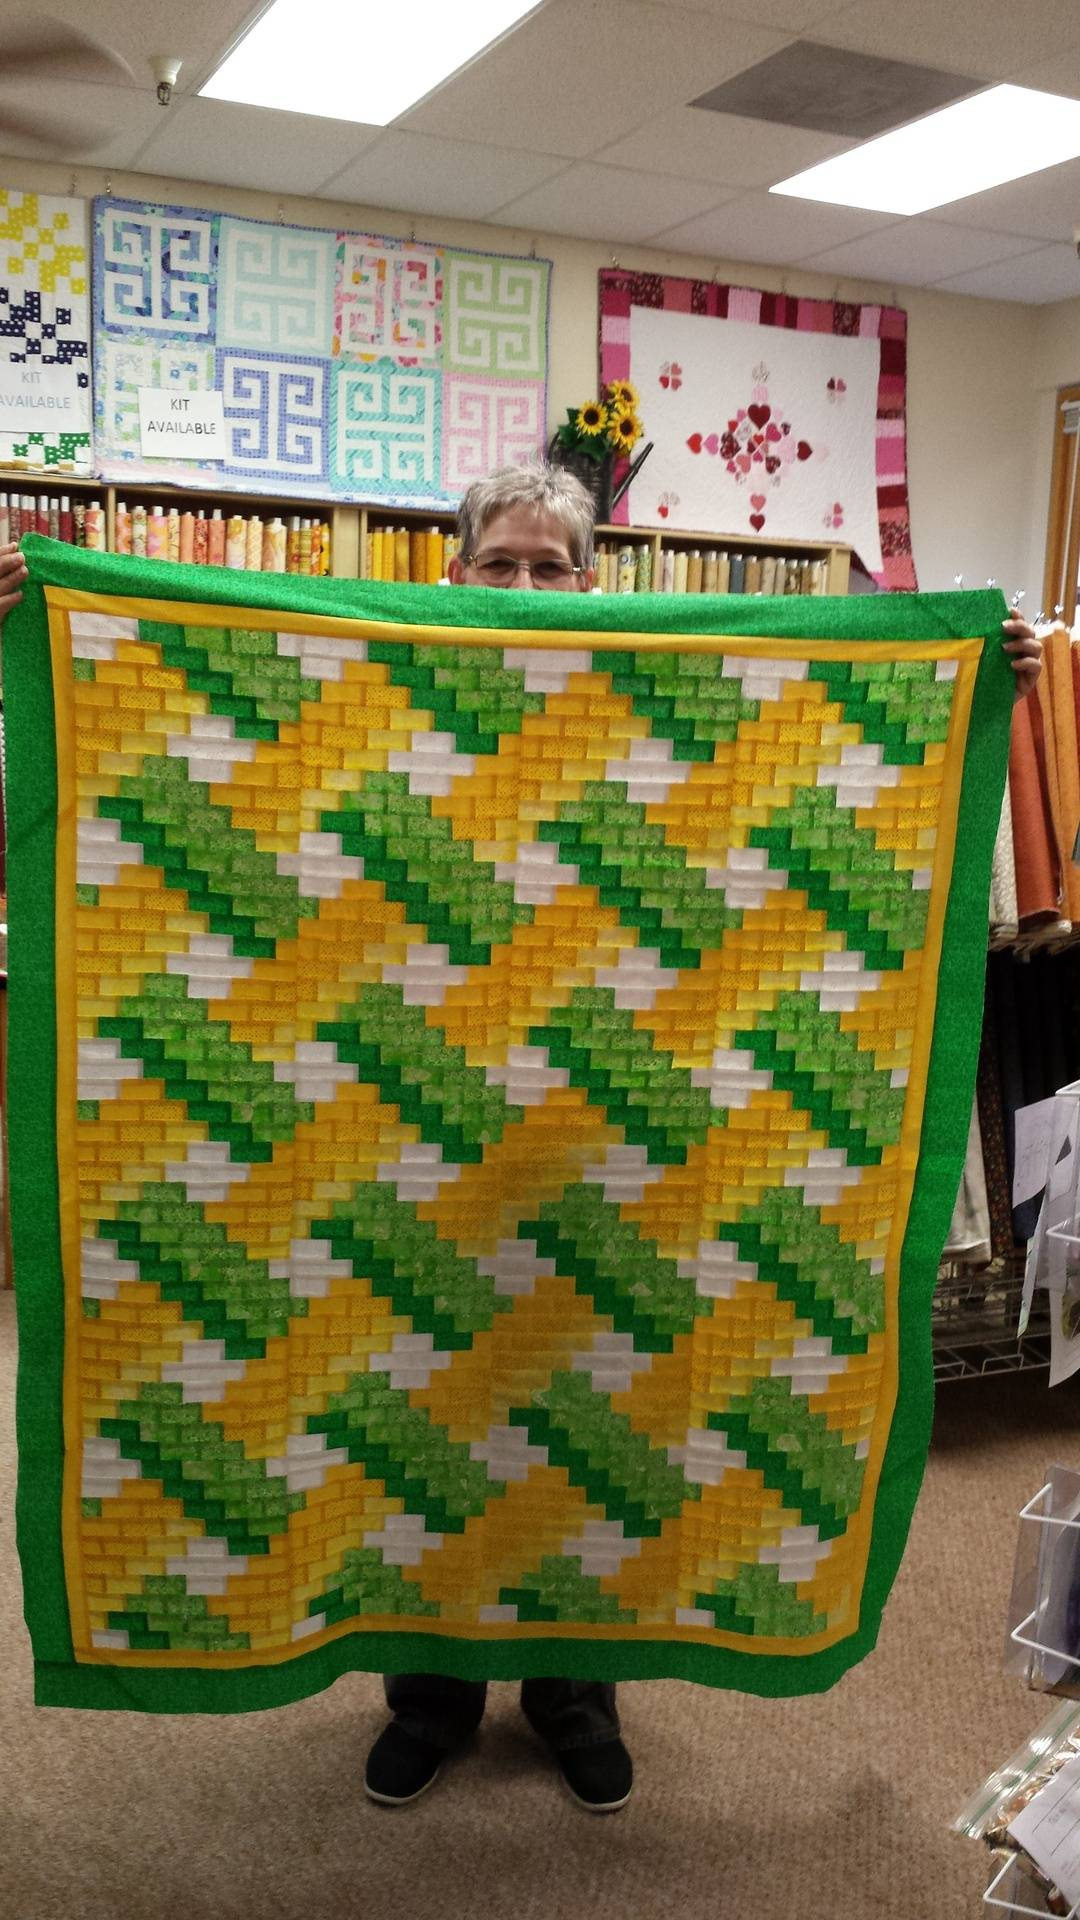 Look at Jan's wonderful Weaver Fever quilt!